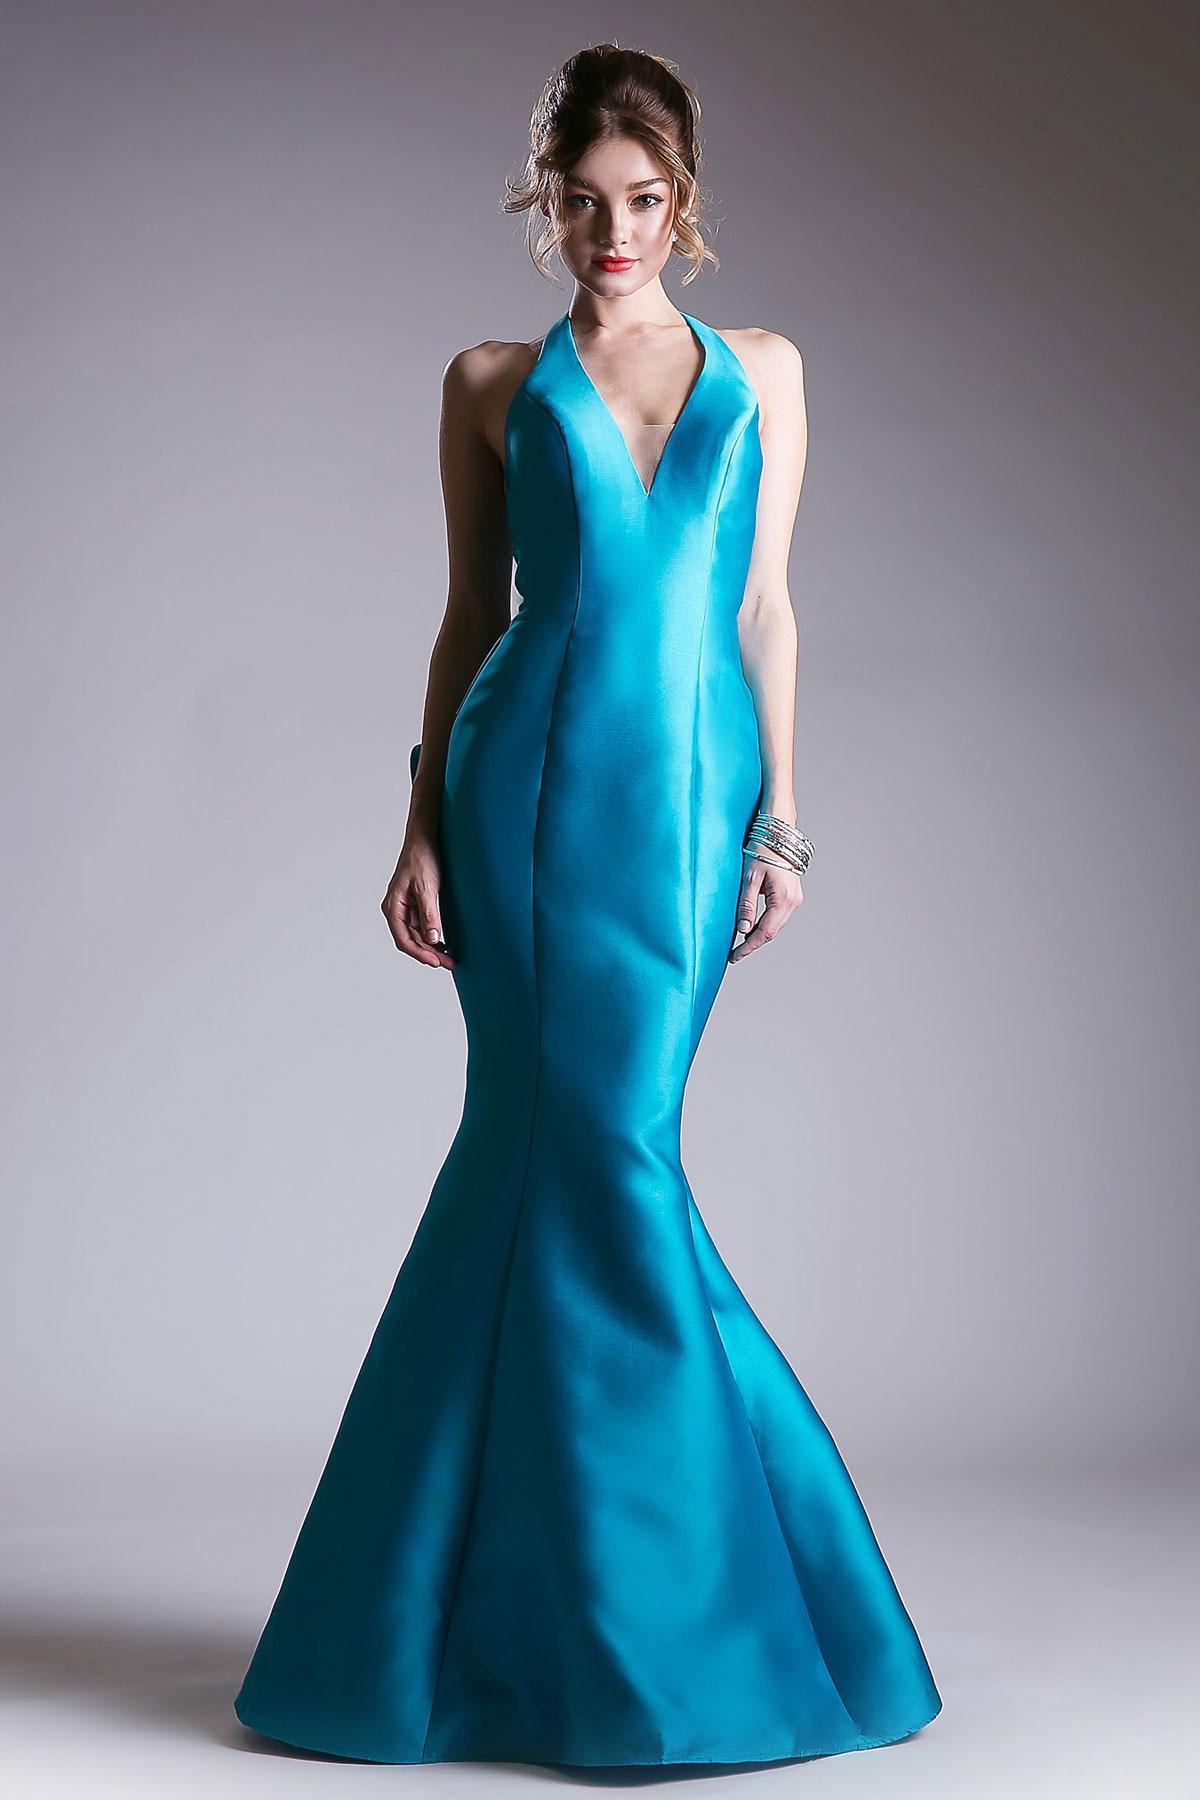 Gown Styles G - galacar